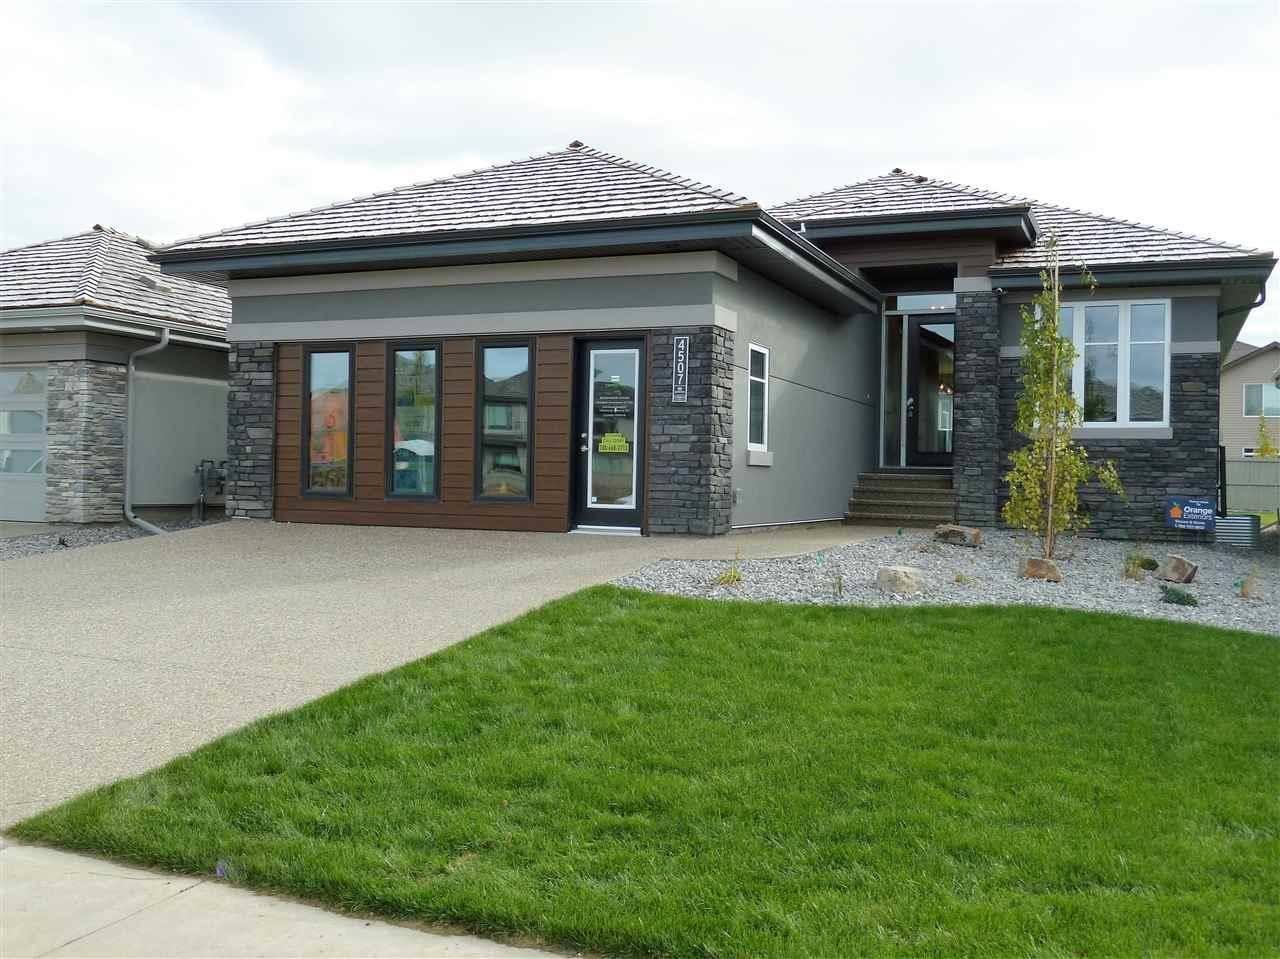 House for sale at 4507 Westcliff Te Sw Edmonton Alberta - MLS: E4177084